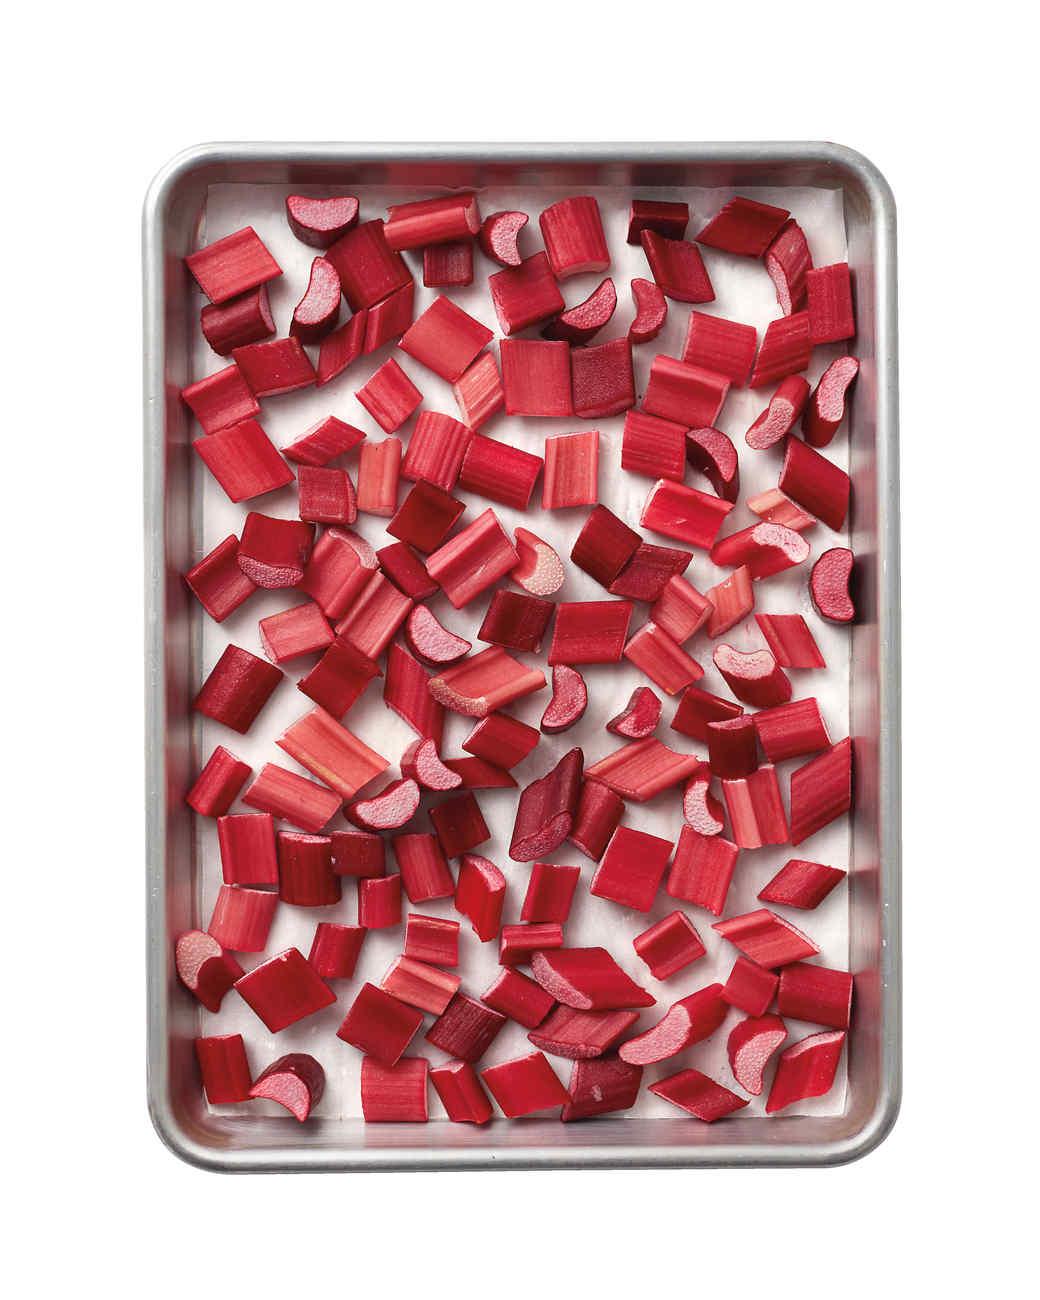 rhubarb-mld110974-128.jpg